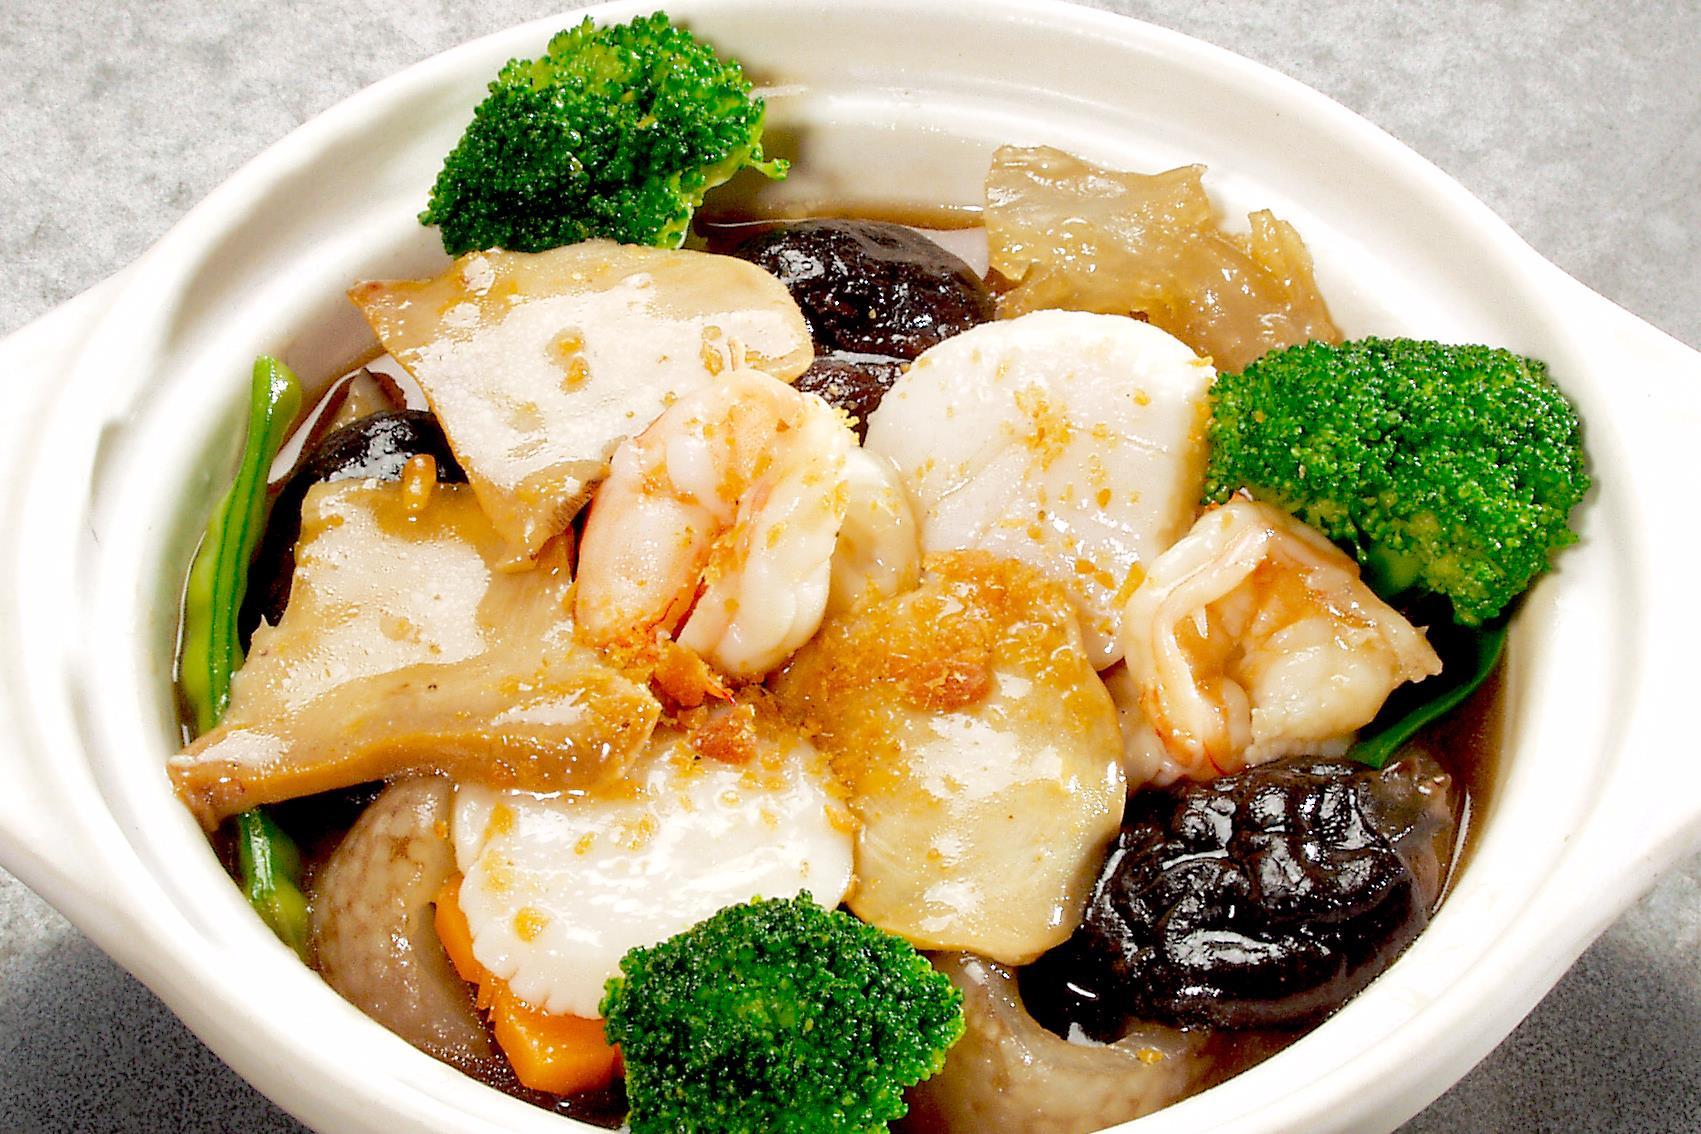 Seafood 海鲜